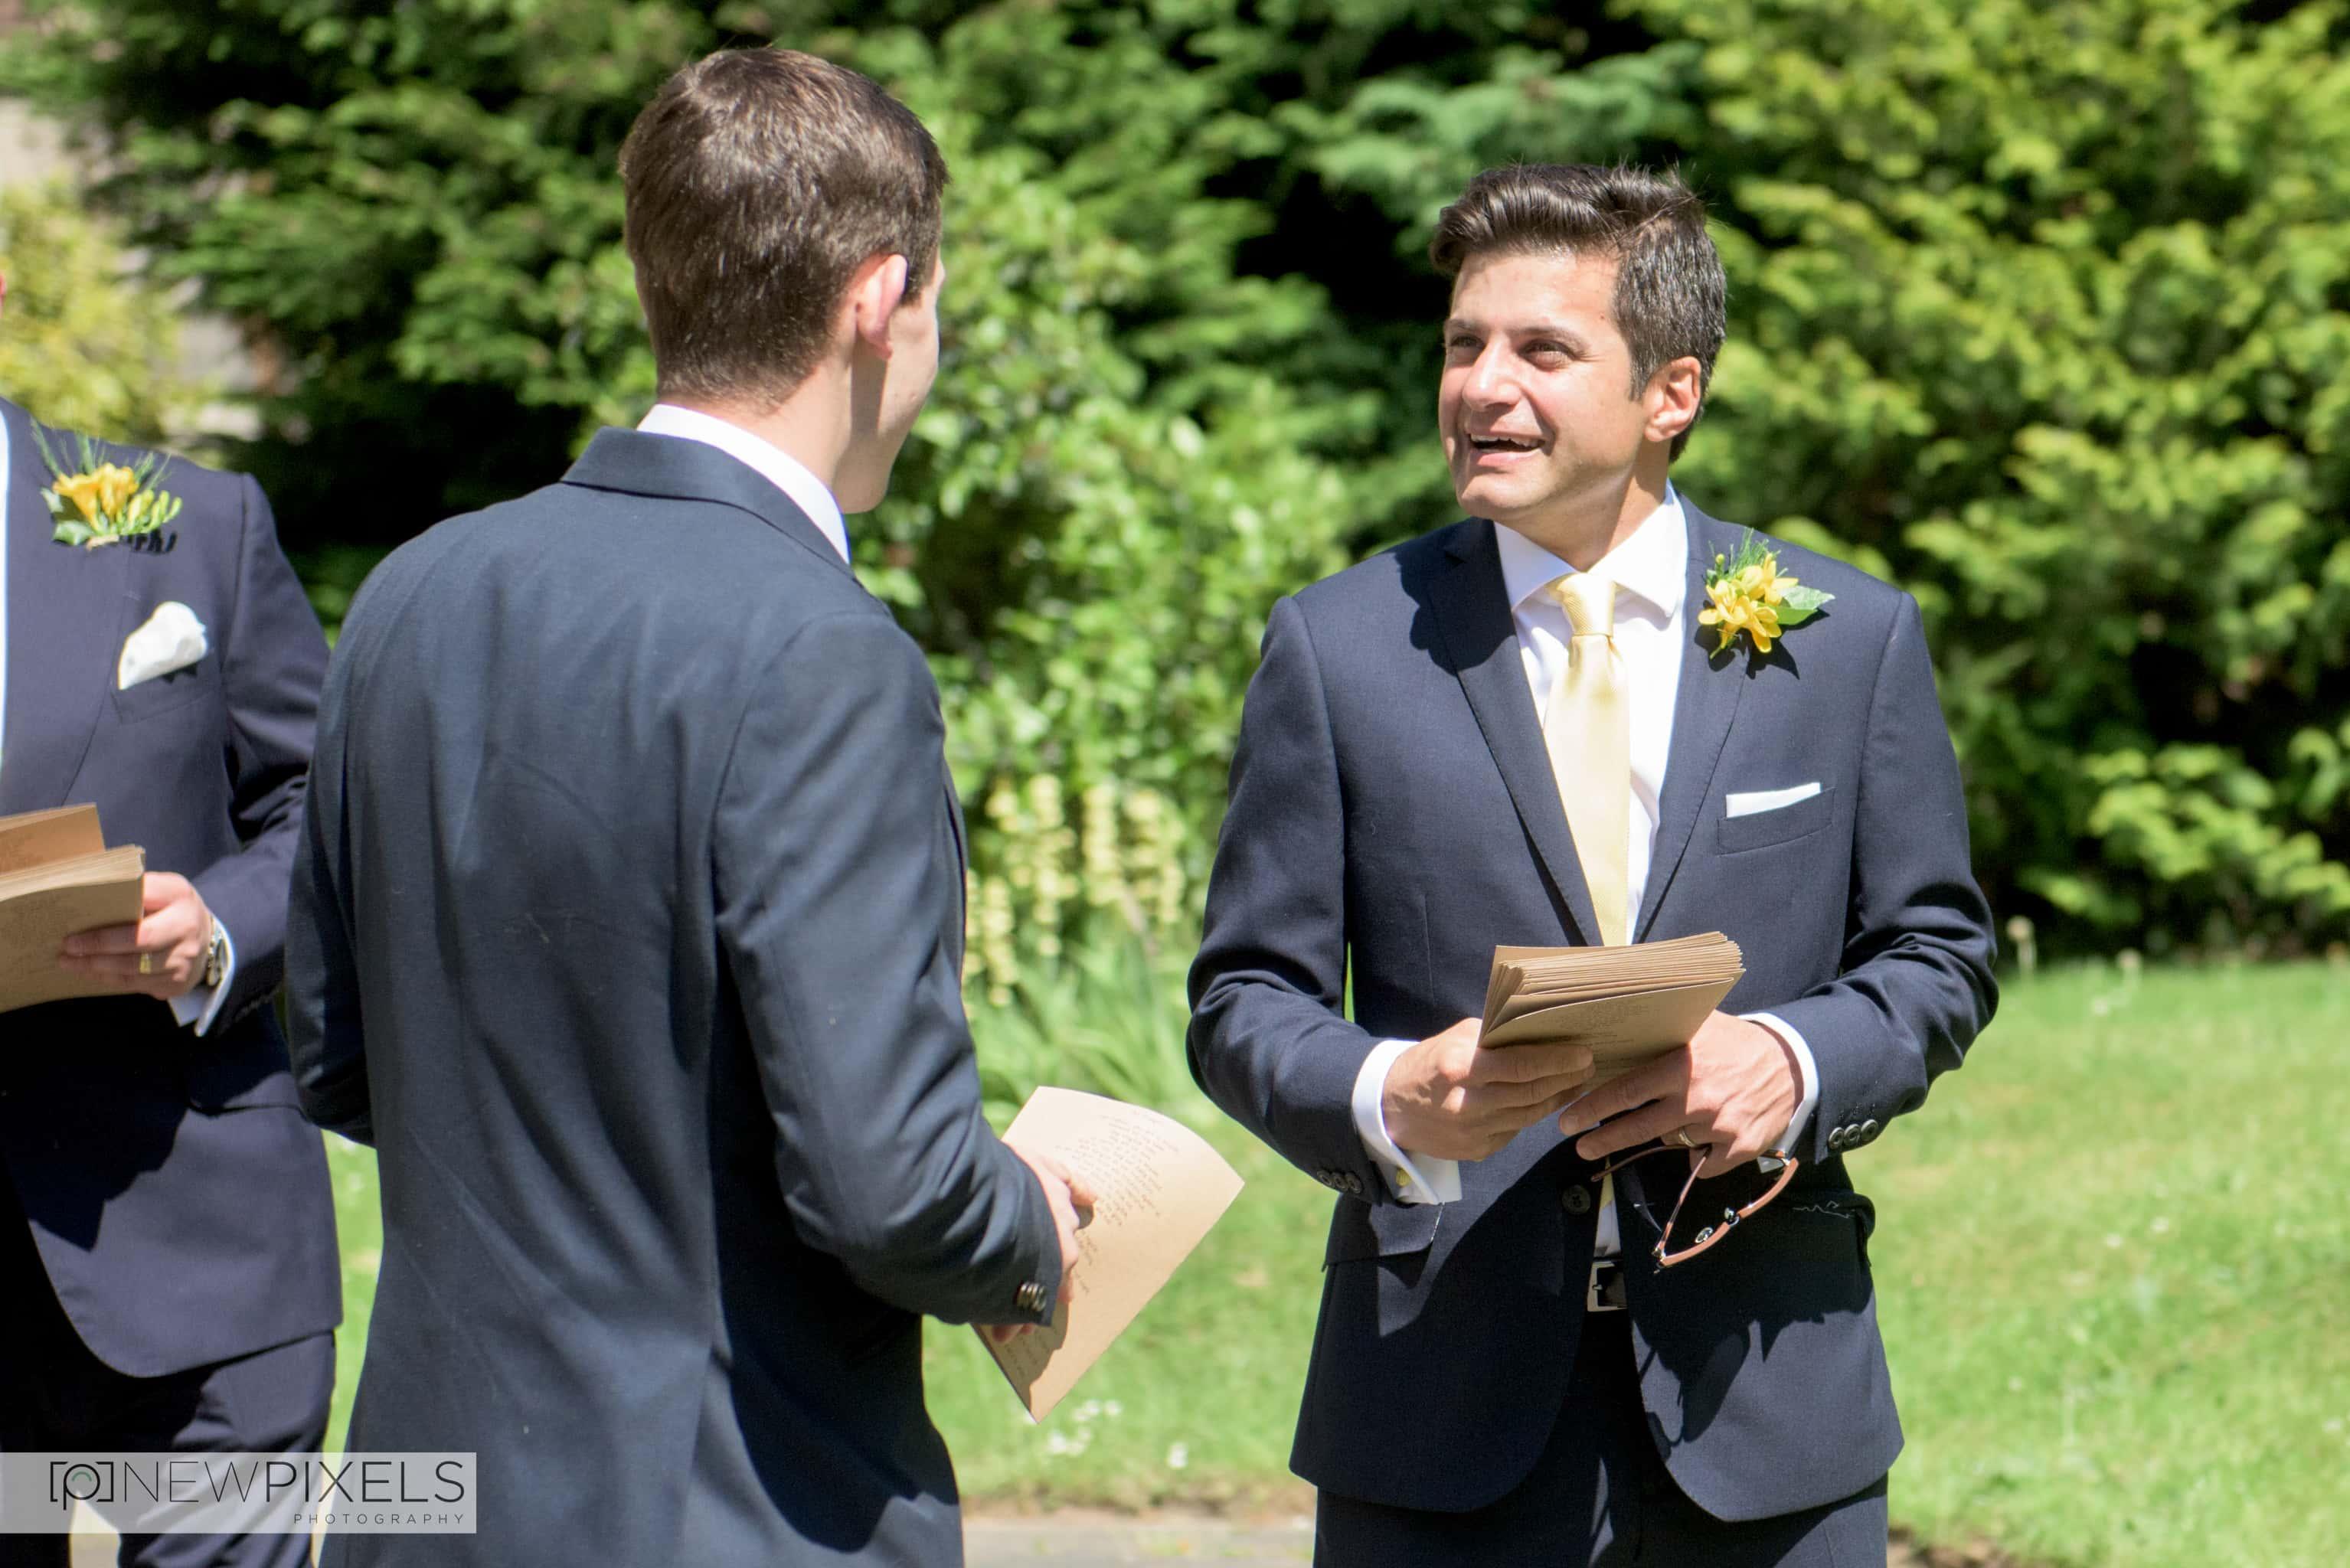 Enfield Wedding Photography- New Pixels-19